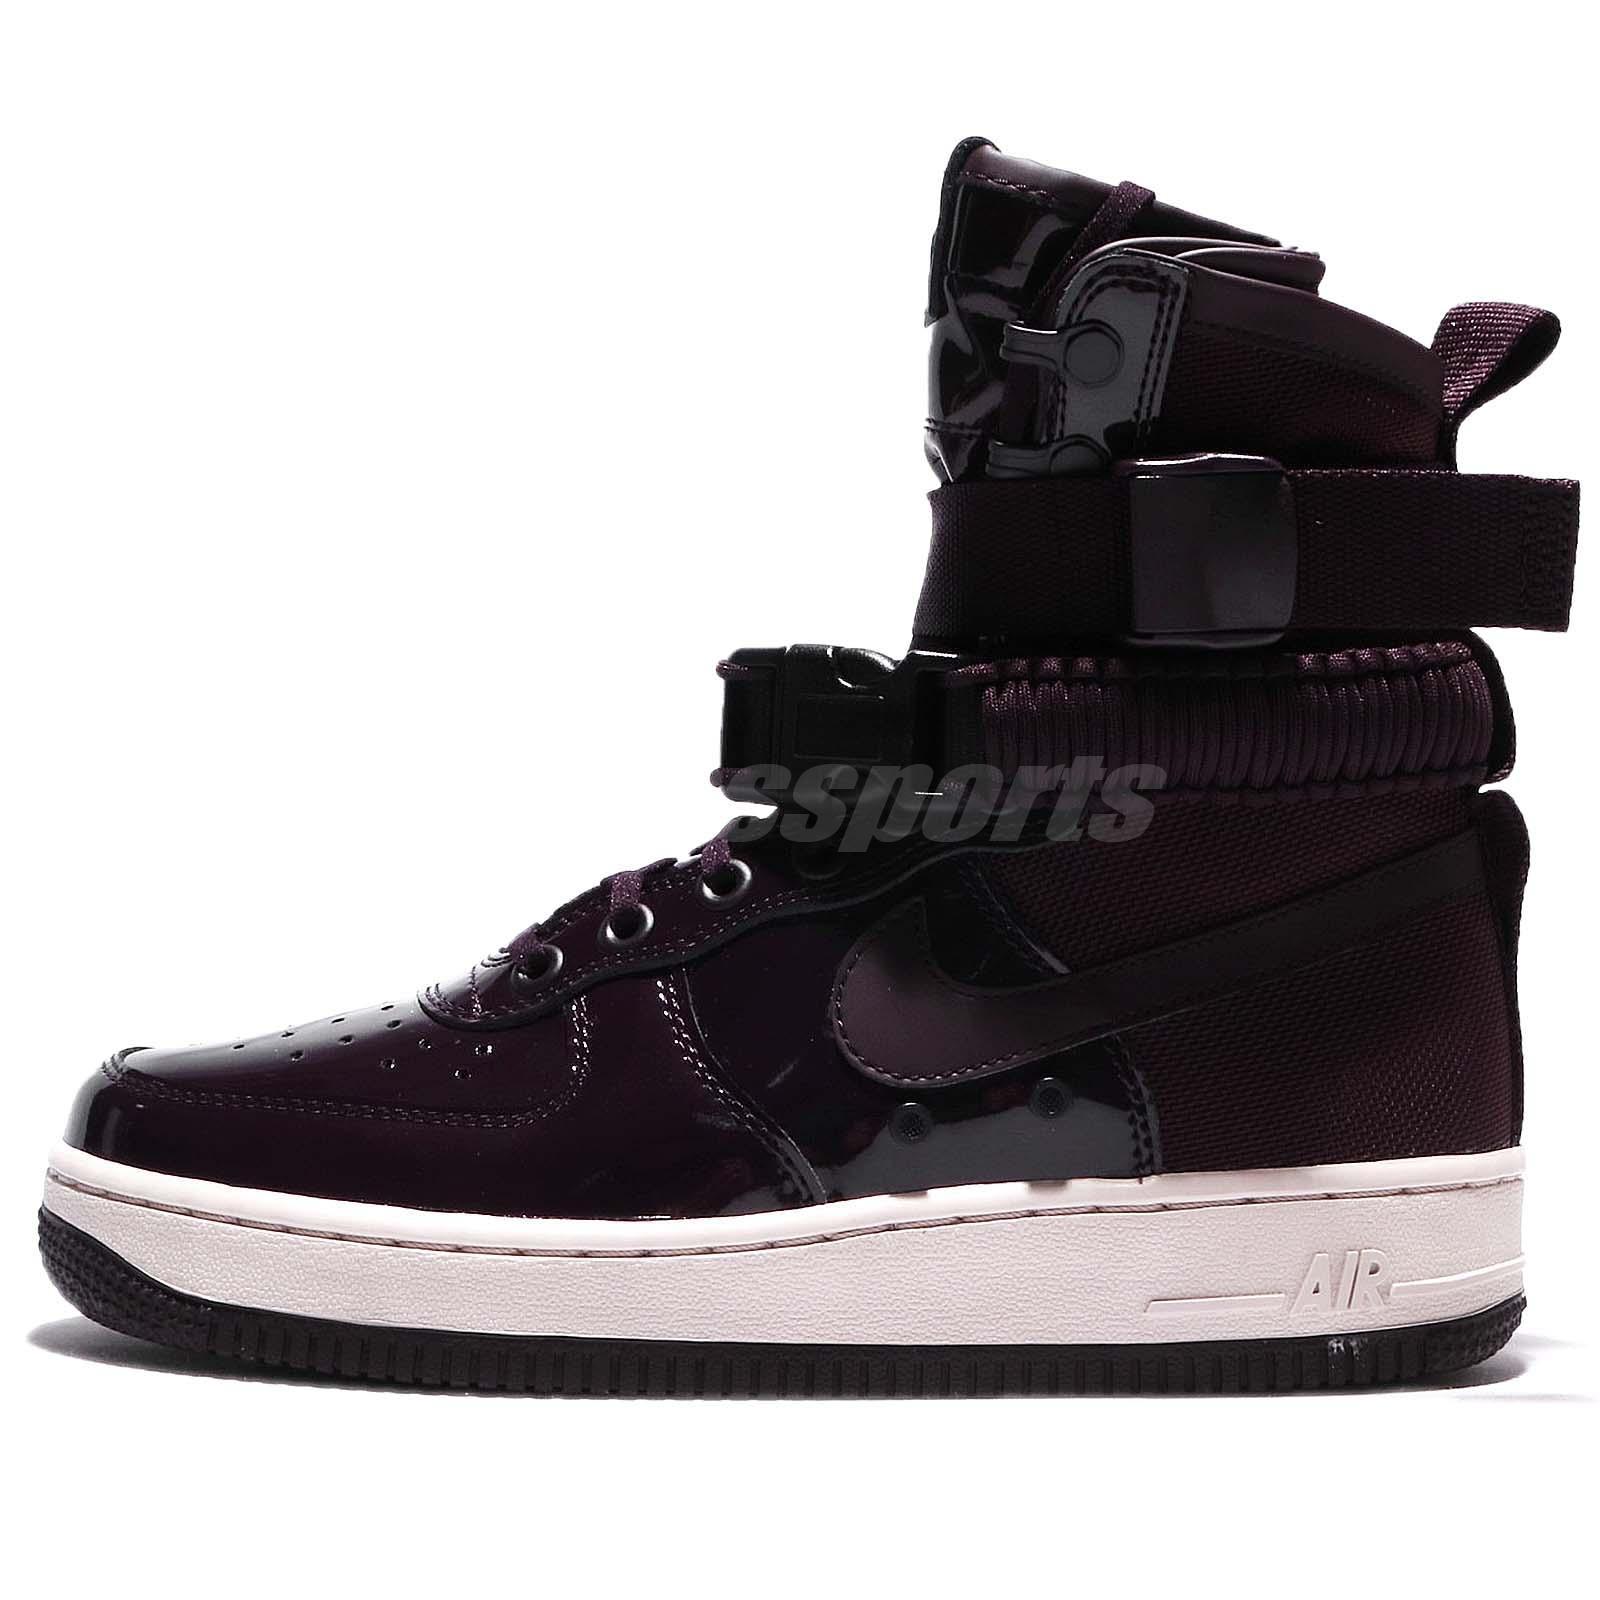 brand new 6a423 b9206 Wmns Nike SF AF1 SE PRM Air Force 1 Hi Ruby Rose Port Wine Women Shoe  AJ0963-600